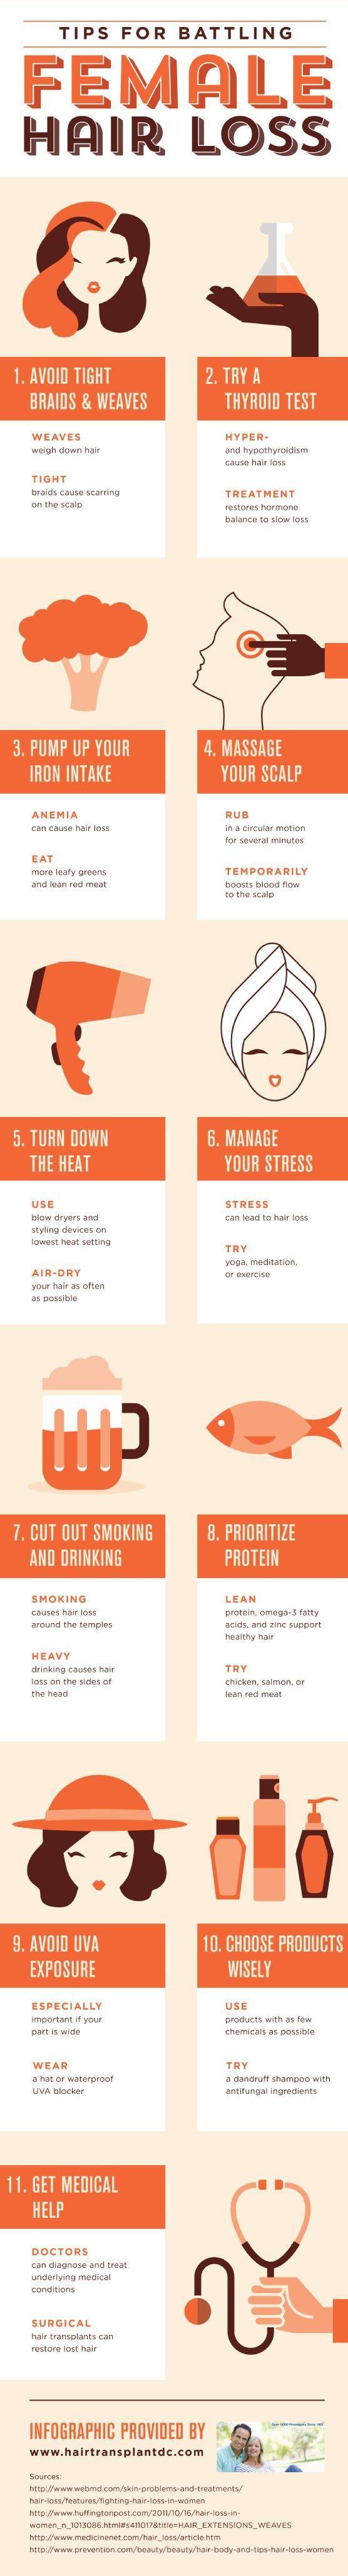 Tips for Battling Female Hair Loss, StopHairLoss#NaturalRemedies